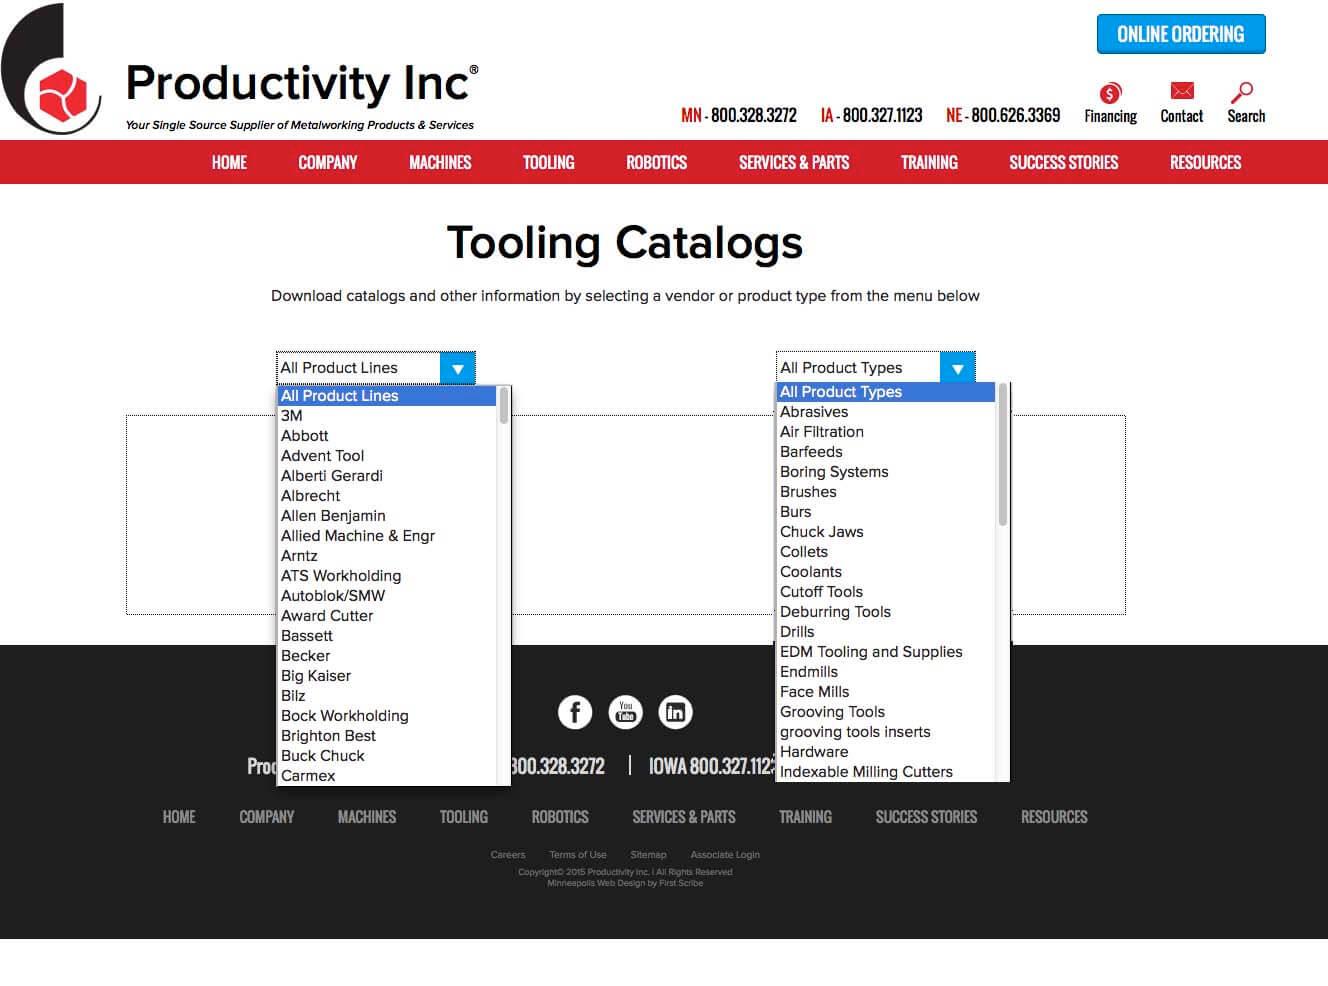 Productivity Inc website tooling catalog web page